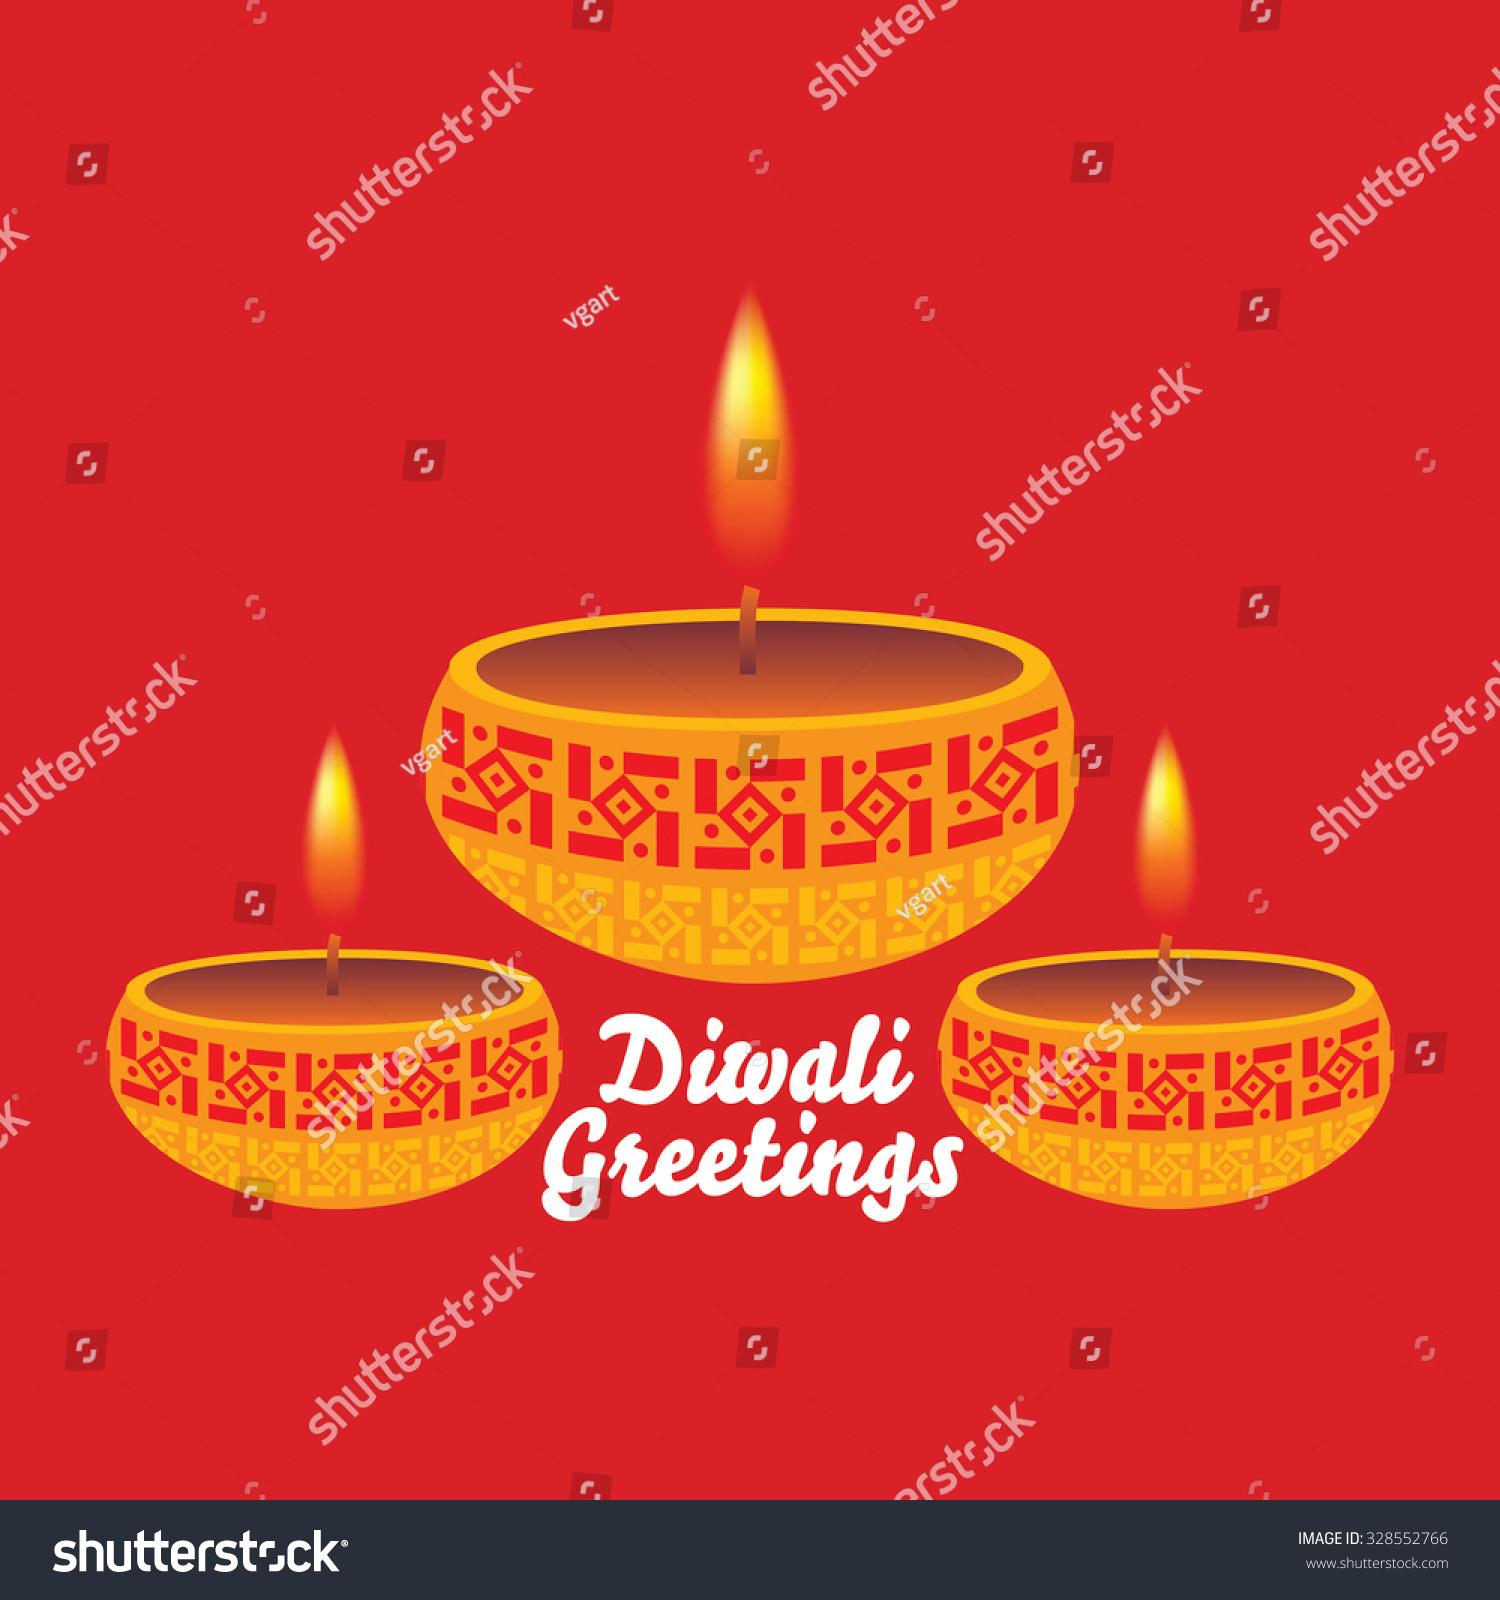 Creative Diwali Greetings Concept Vector Illustration Ez Canvas